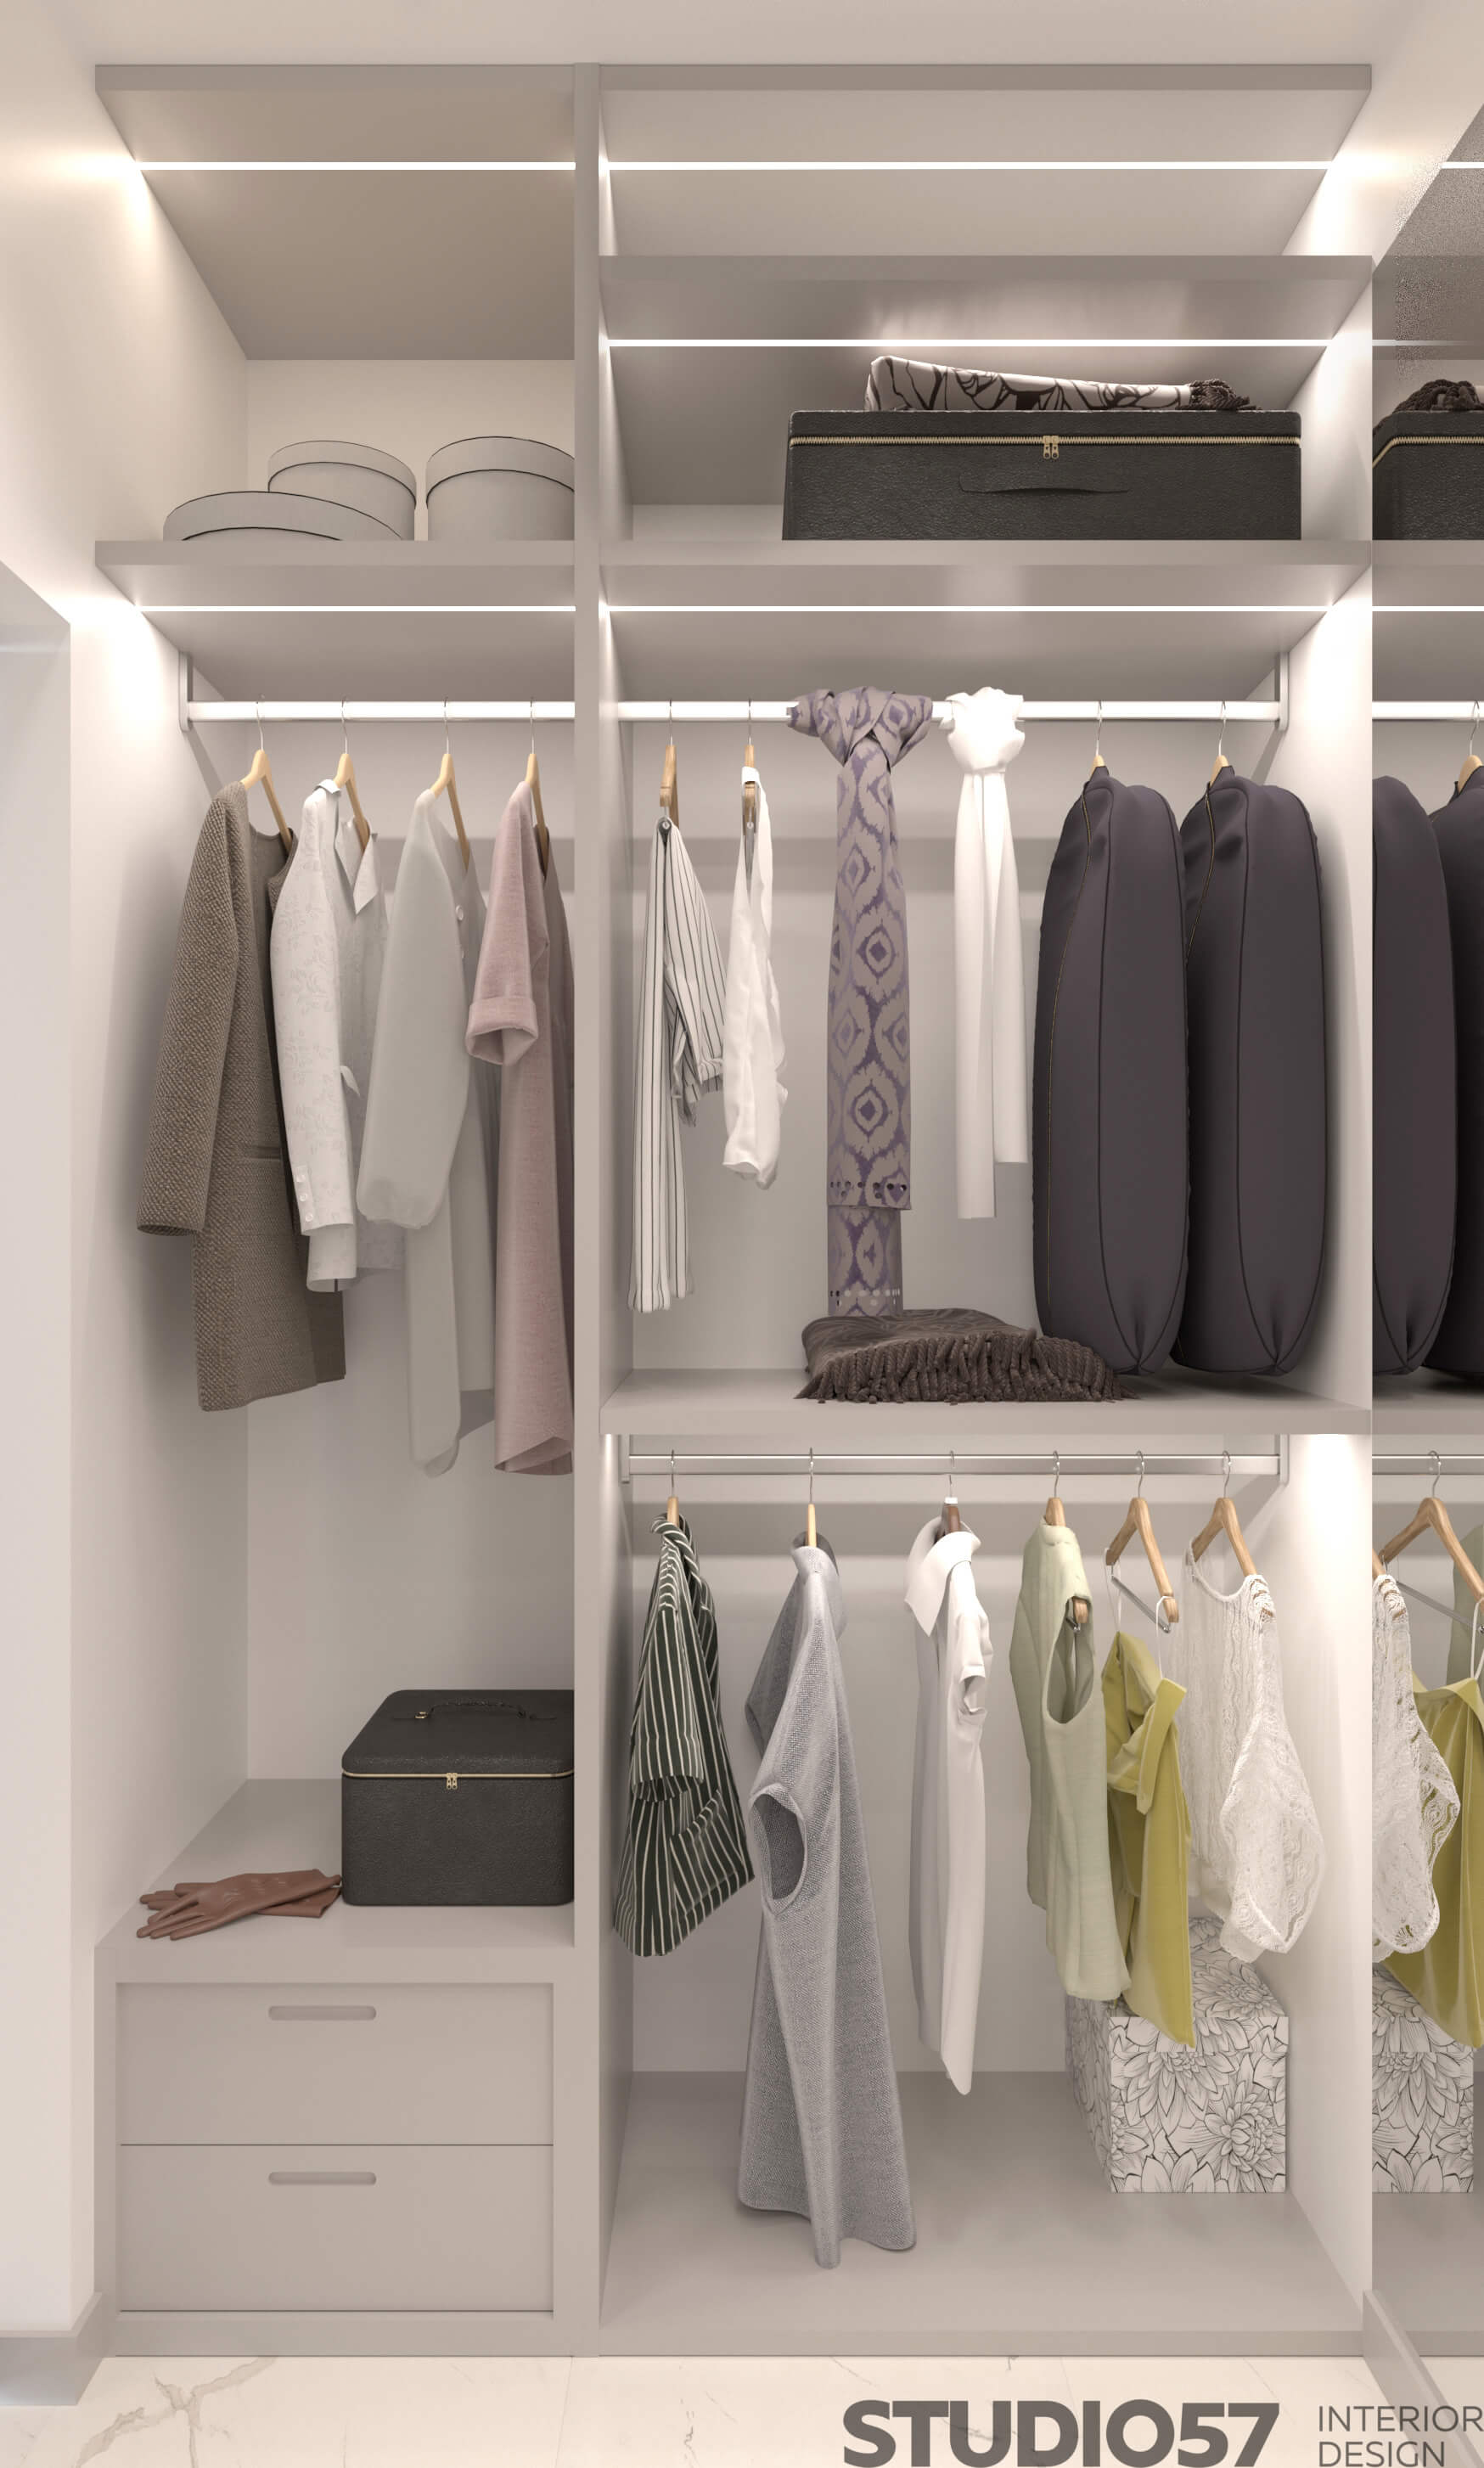 Interior of the wardrobe room 2018 photo